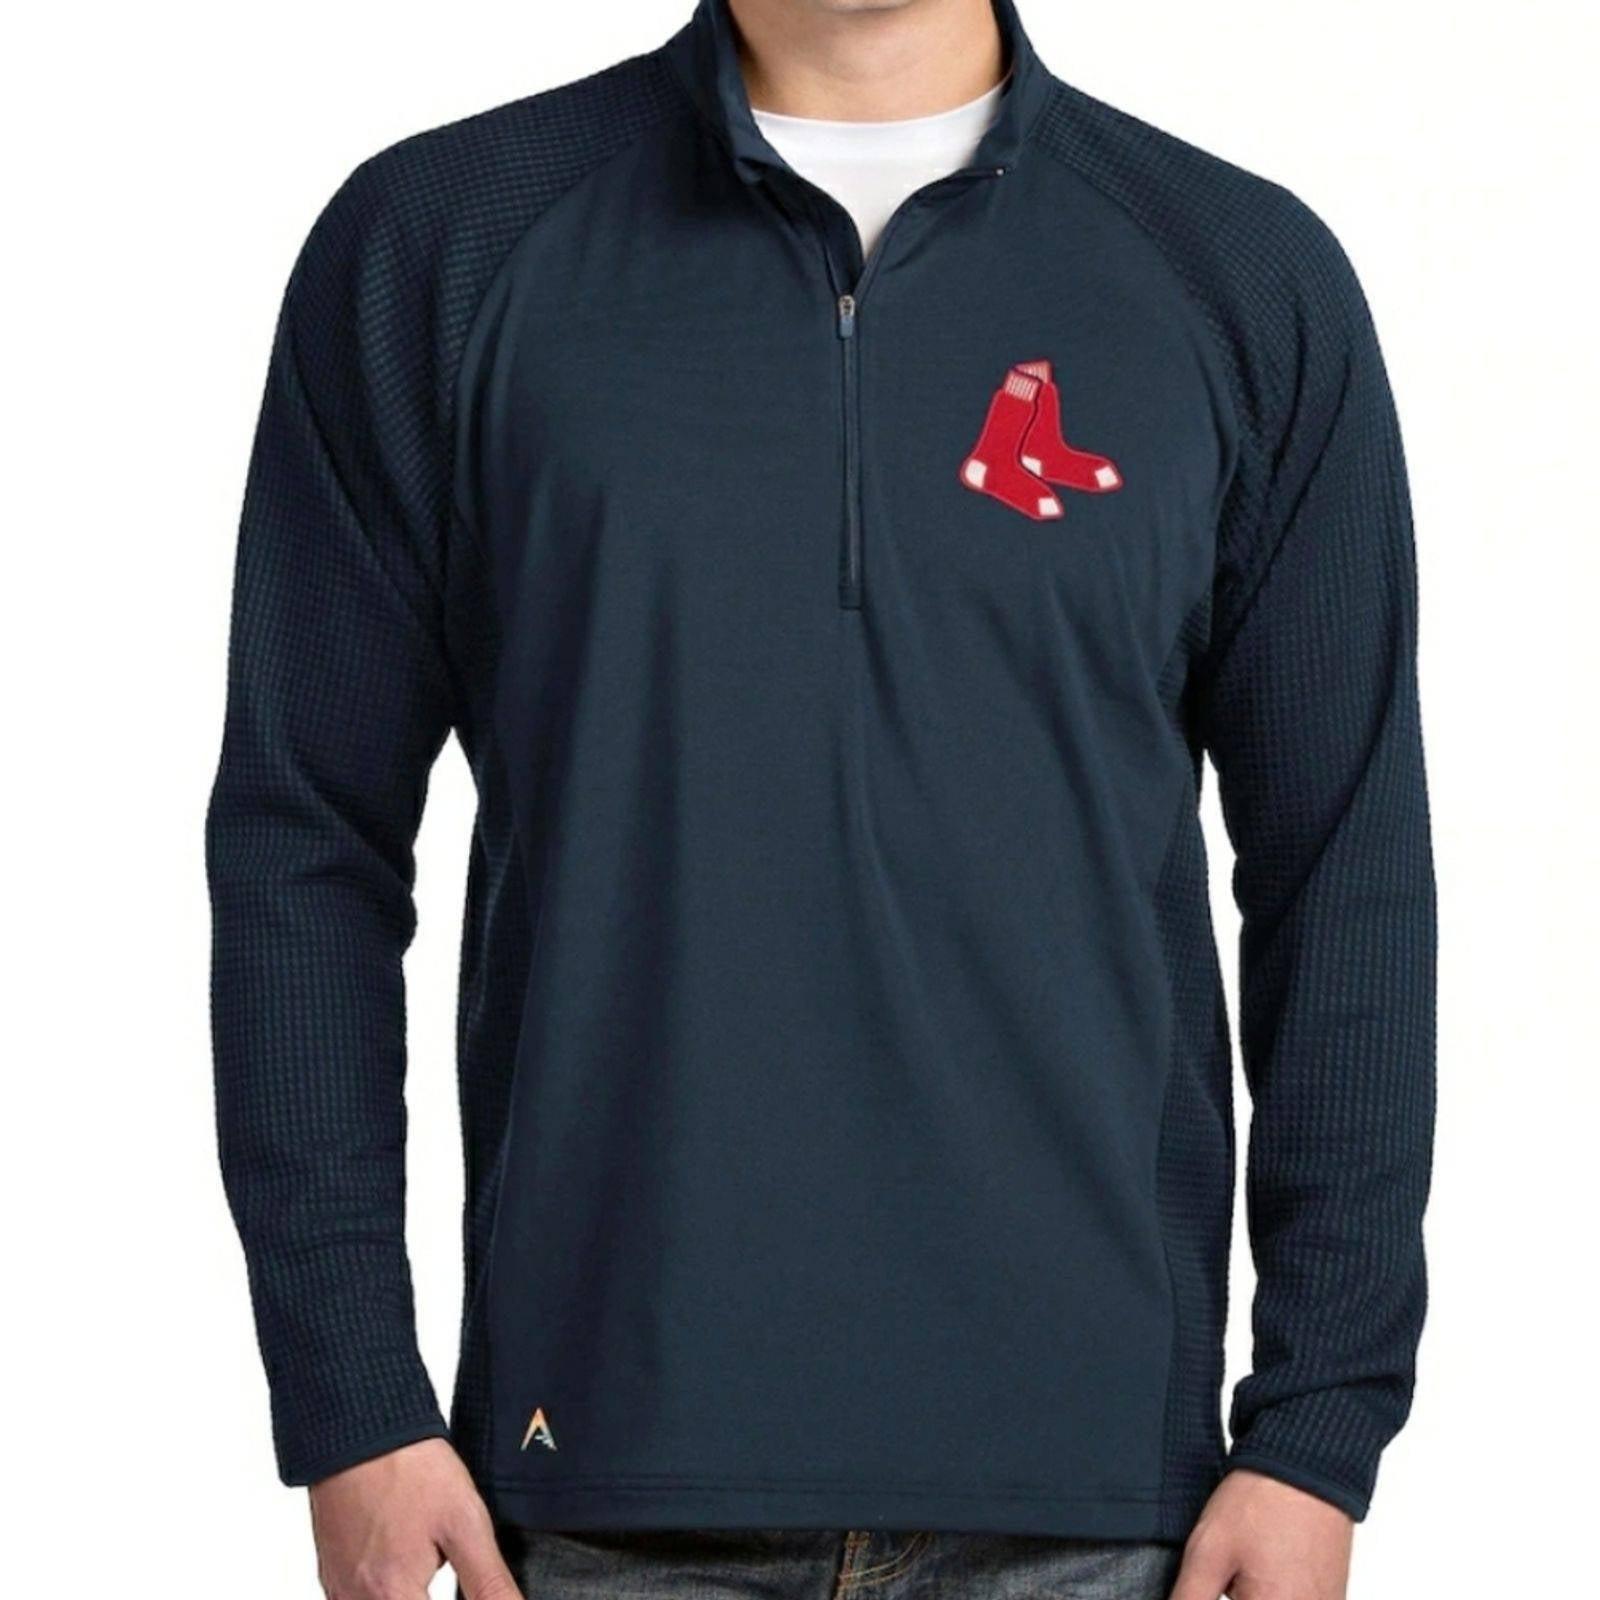 Antigua New MLB Navy Red Sox 1/4 Zip